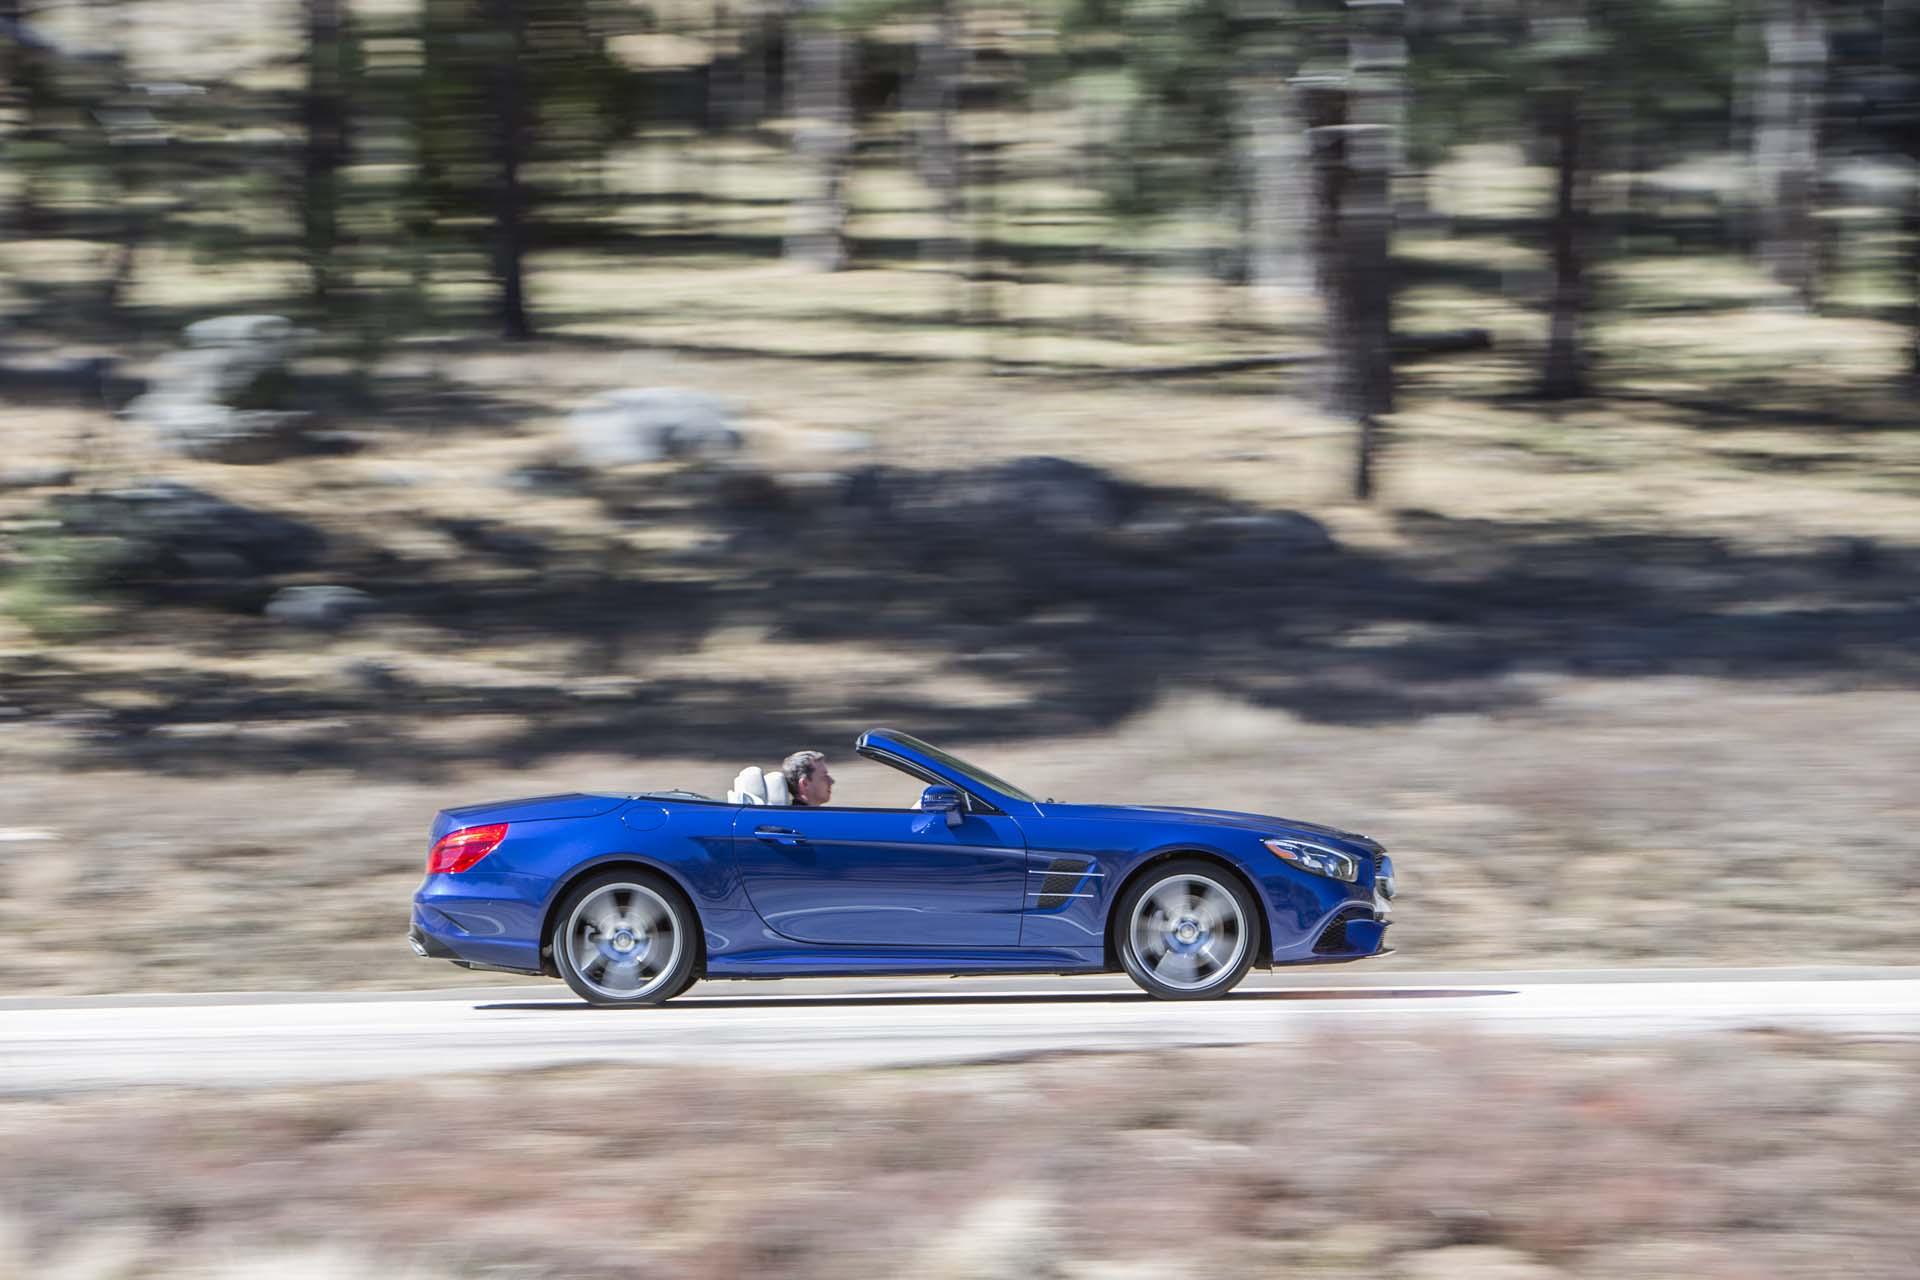 2018 mercedes benz sl class performance review the car for Mercedes benz sl 2018